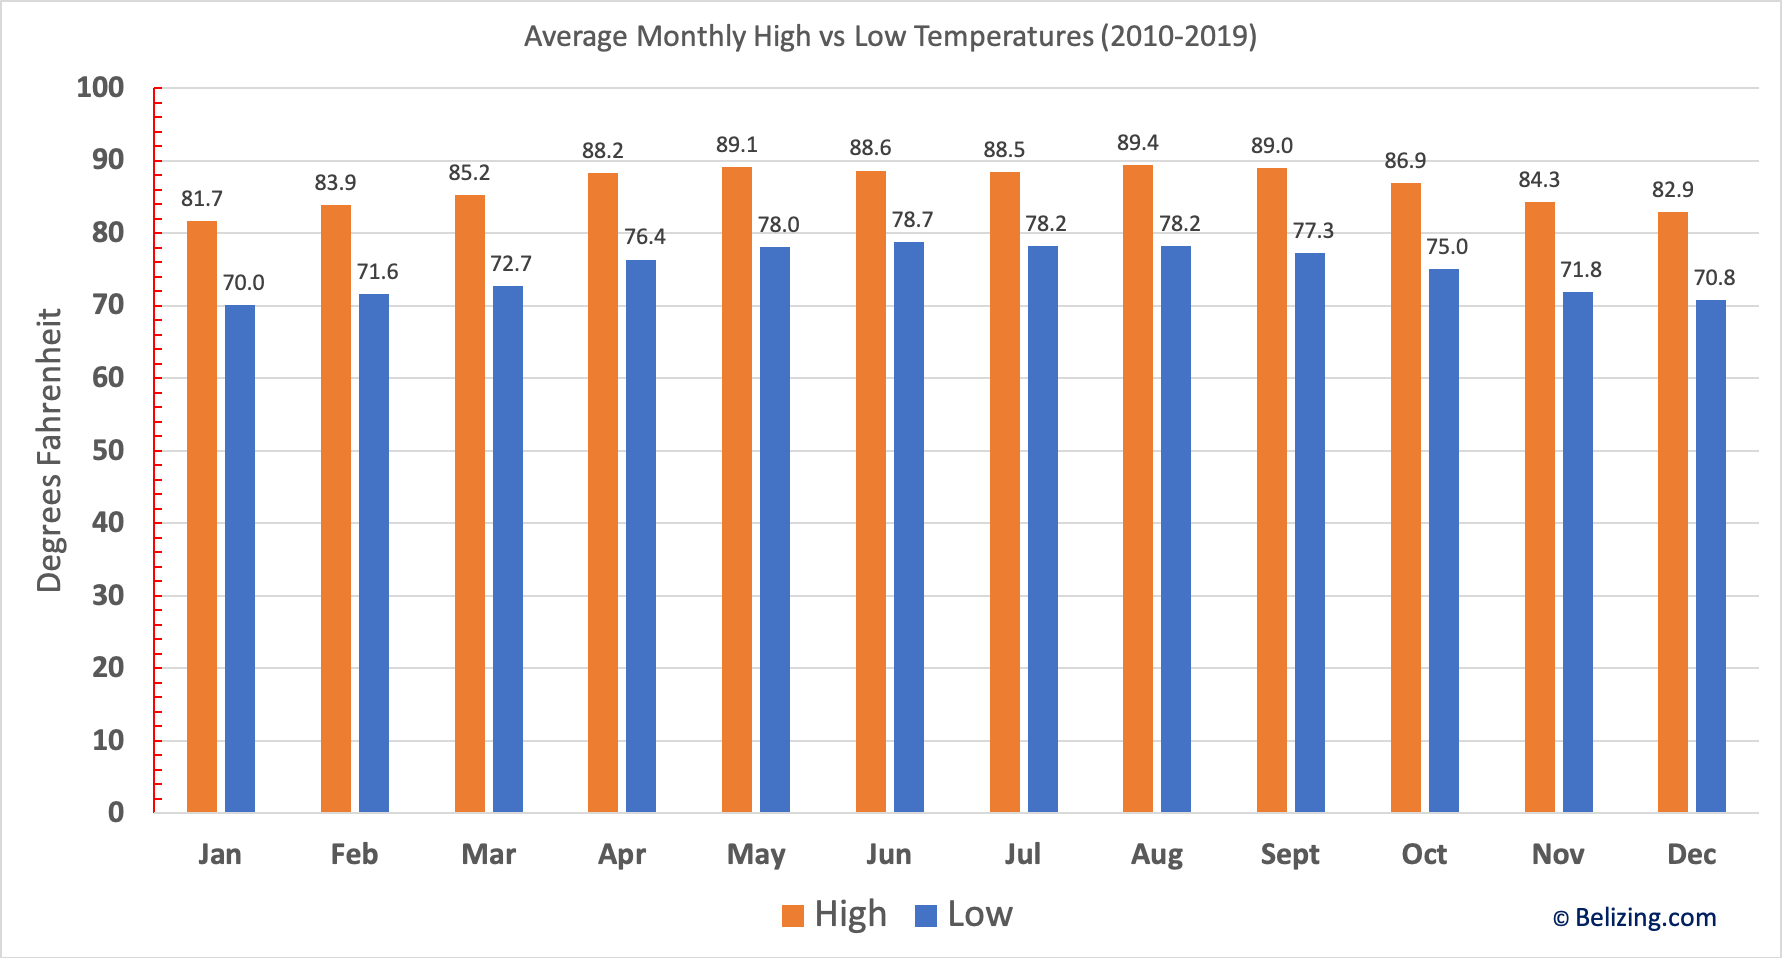 Average Monthly Temperatures in Belize - Fahrenheit